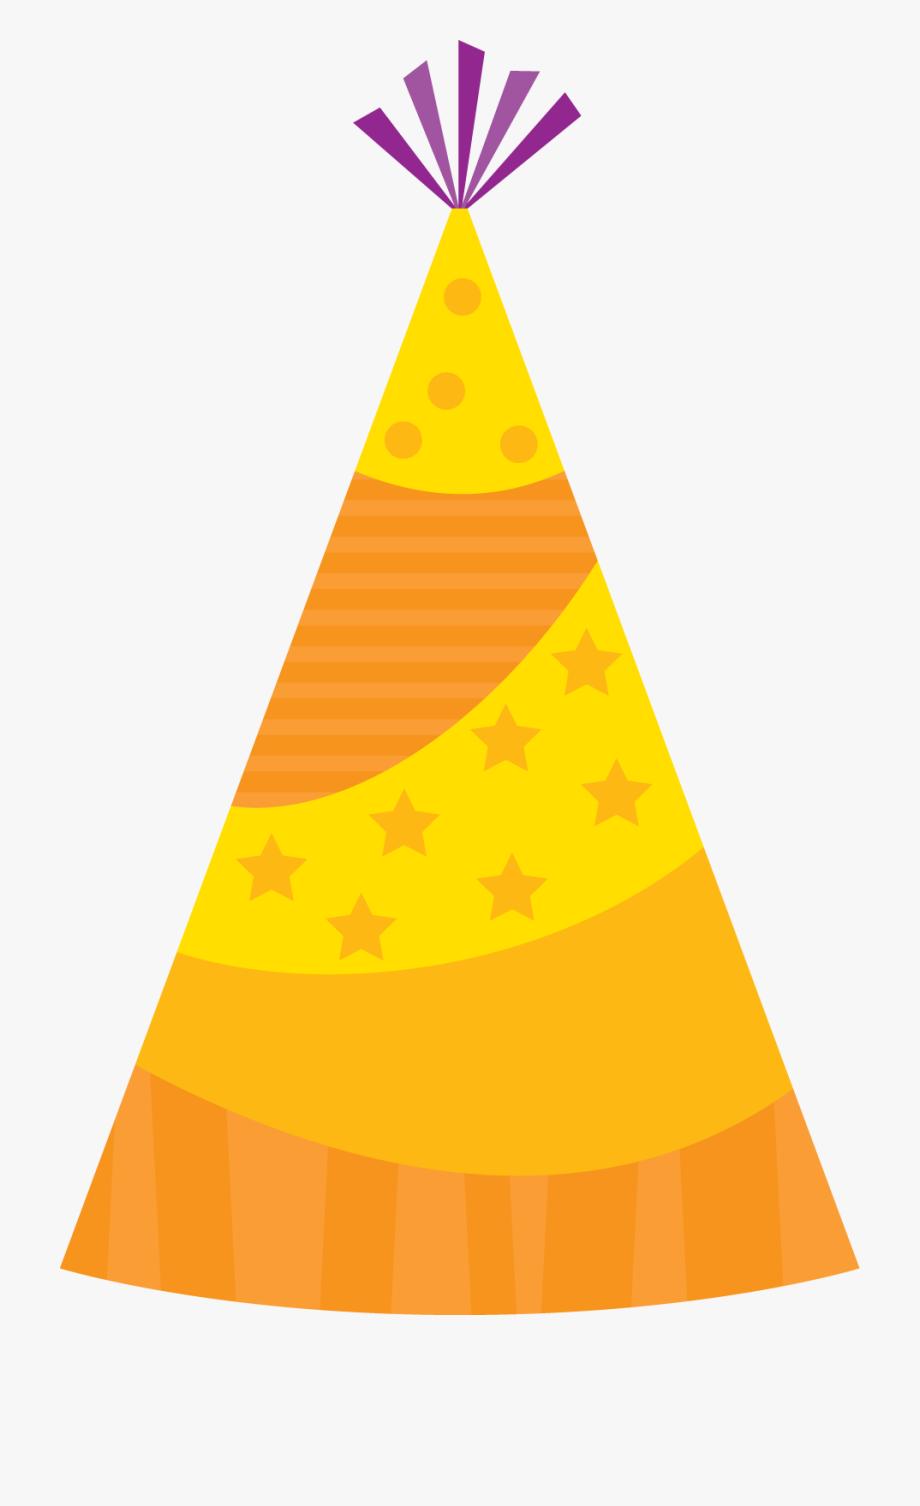 Party hat clipart png vector transparent Party Hat Clipart Png - Birthday Hat Png Clipart #949971 ... vector transparent